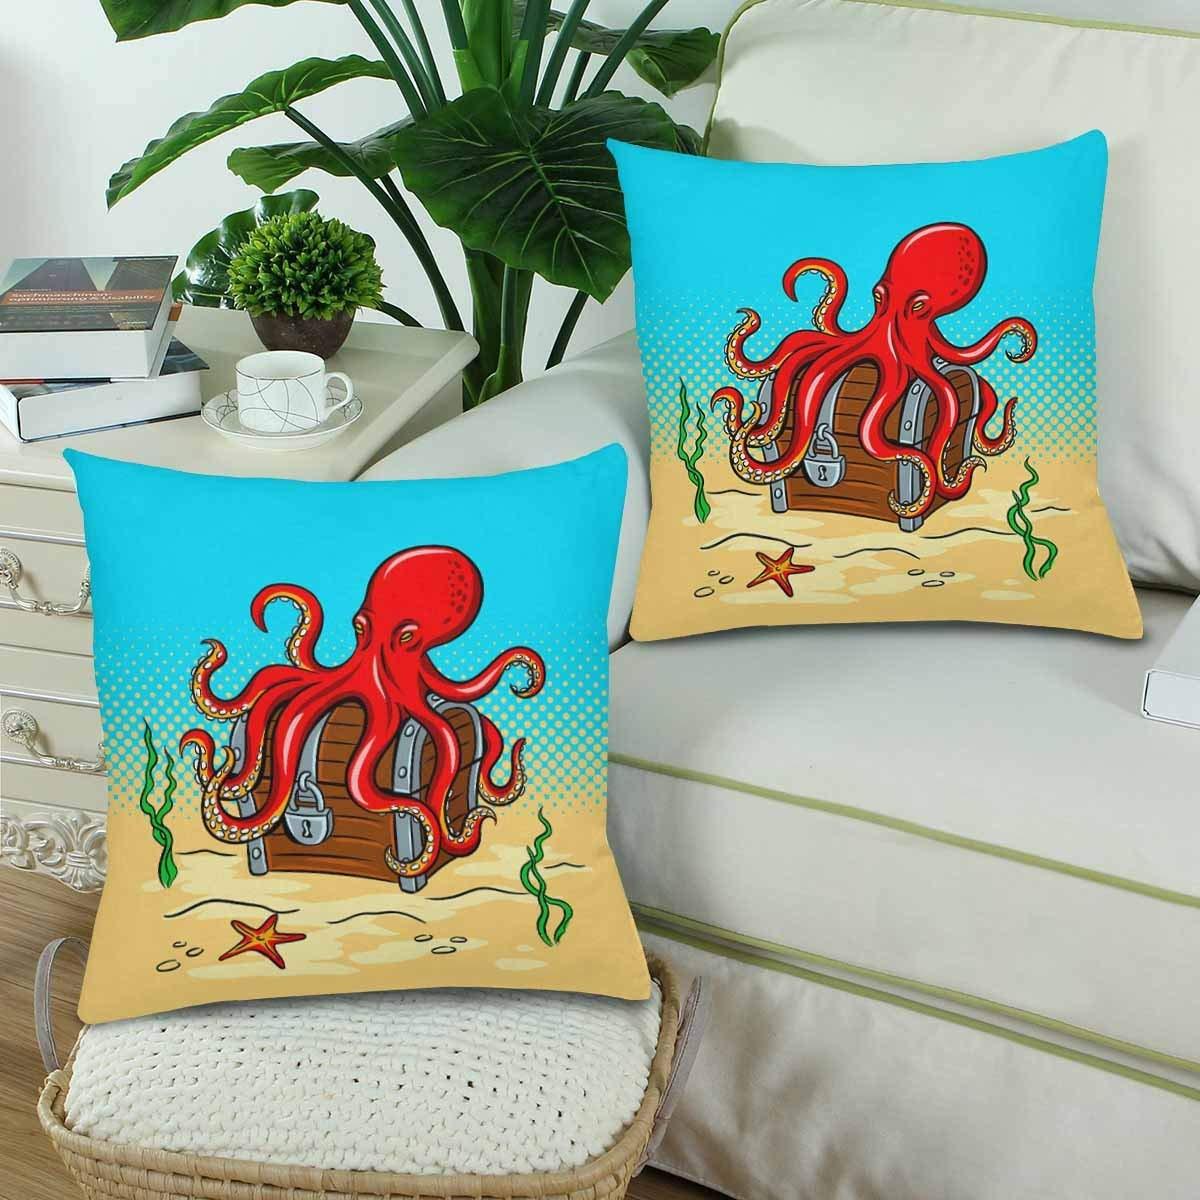 GCKG Octopus Guards Treasure Chest Pop Art Throw Pillow Covers 18x18 inches Set of 2 - image 1 de 3